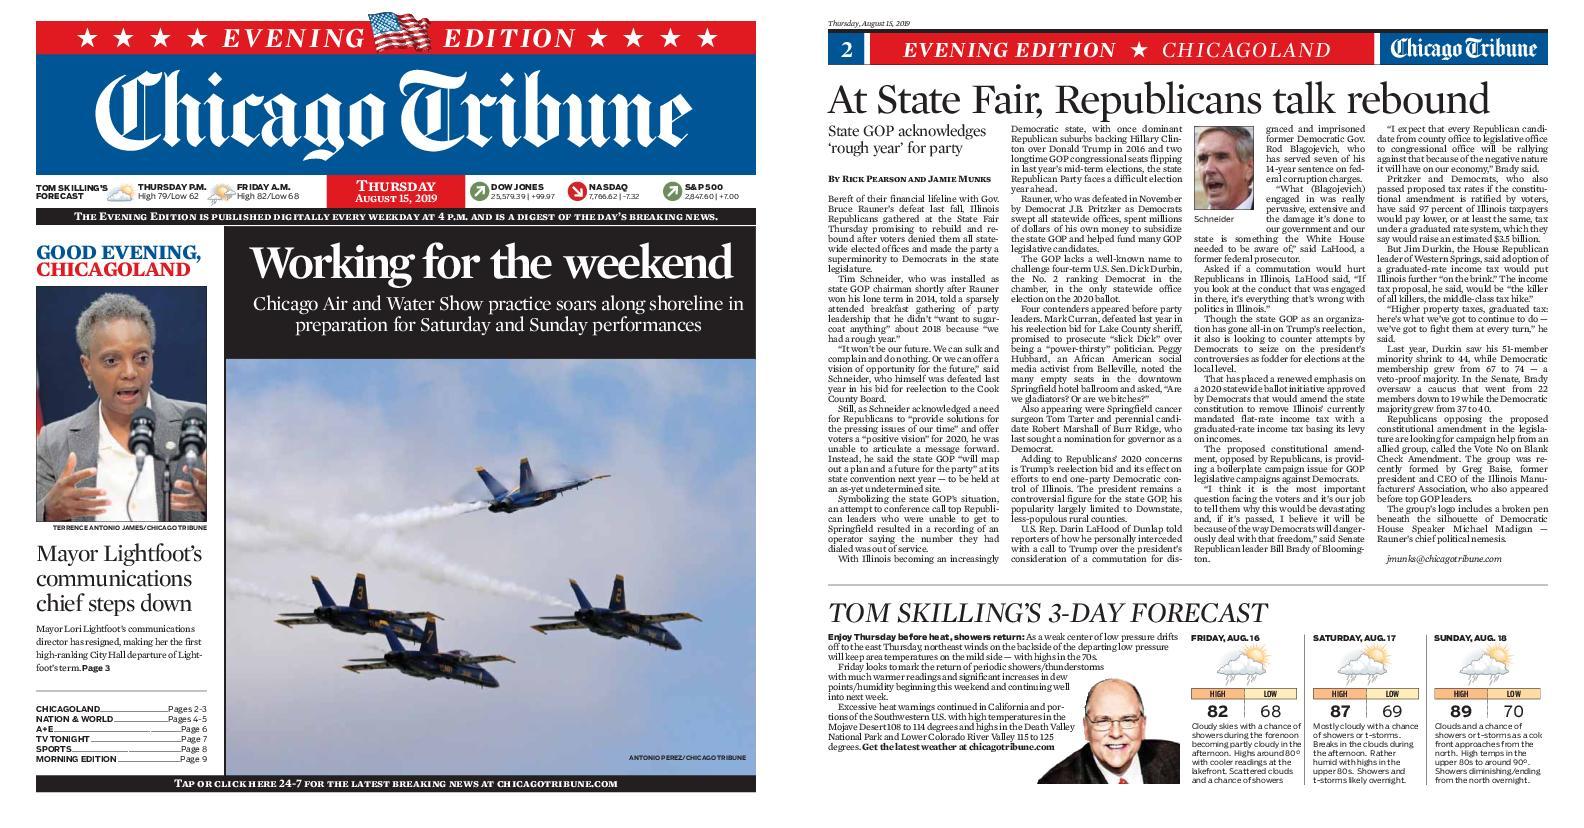 Chicago Tribune Evening Edition – August 15, 2019